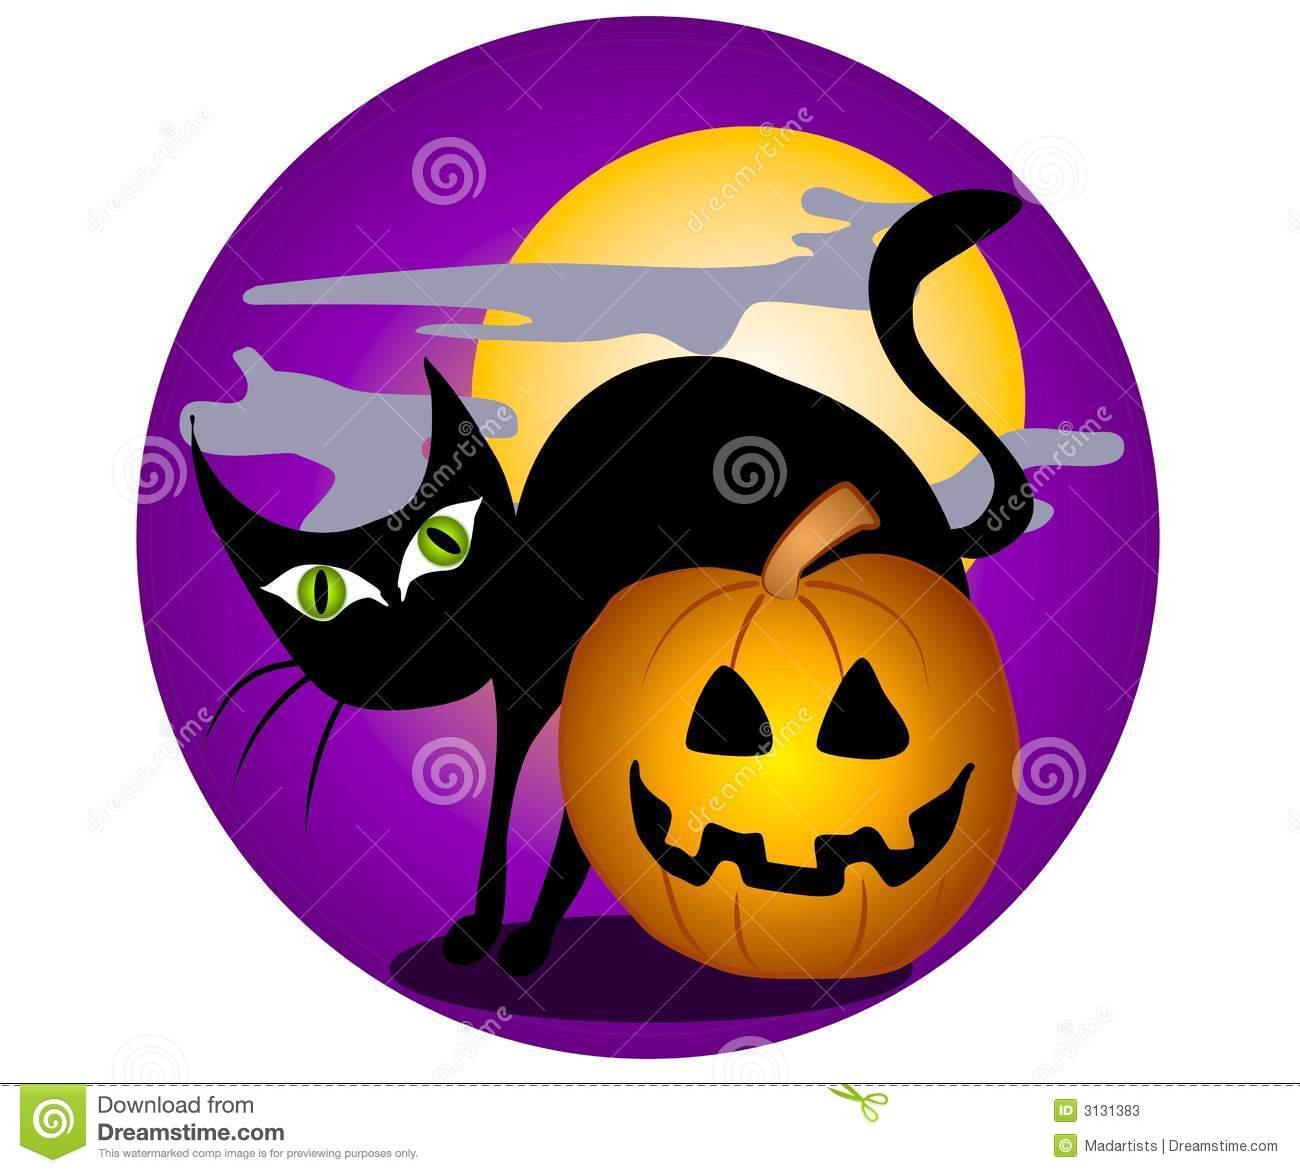 Black Cat Halloween Clip Art 2 Stock Pho-Black Cat Halloween Clip Art 2 Stock Photos-0